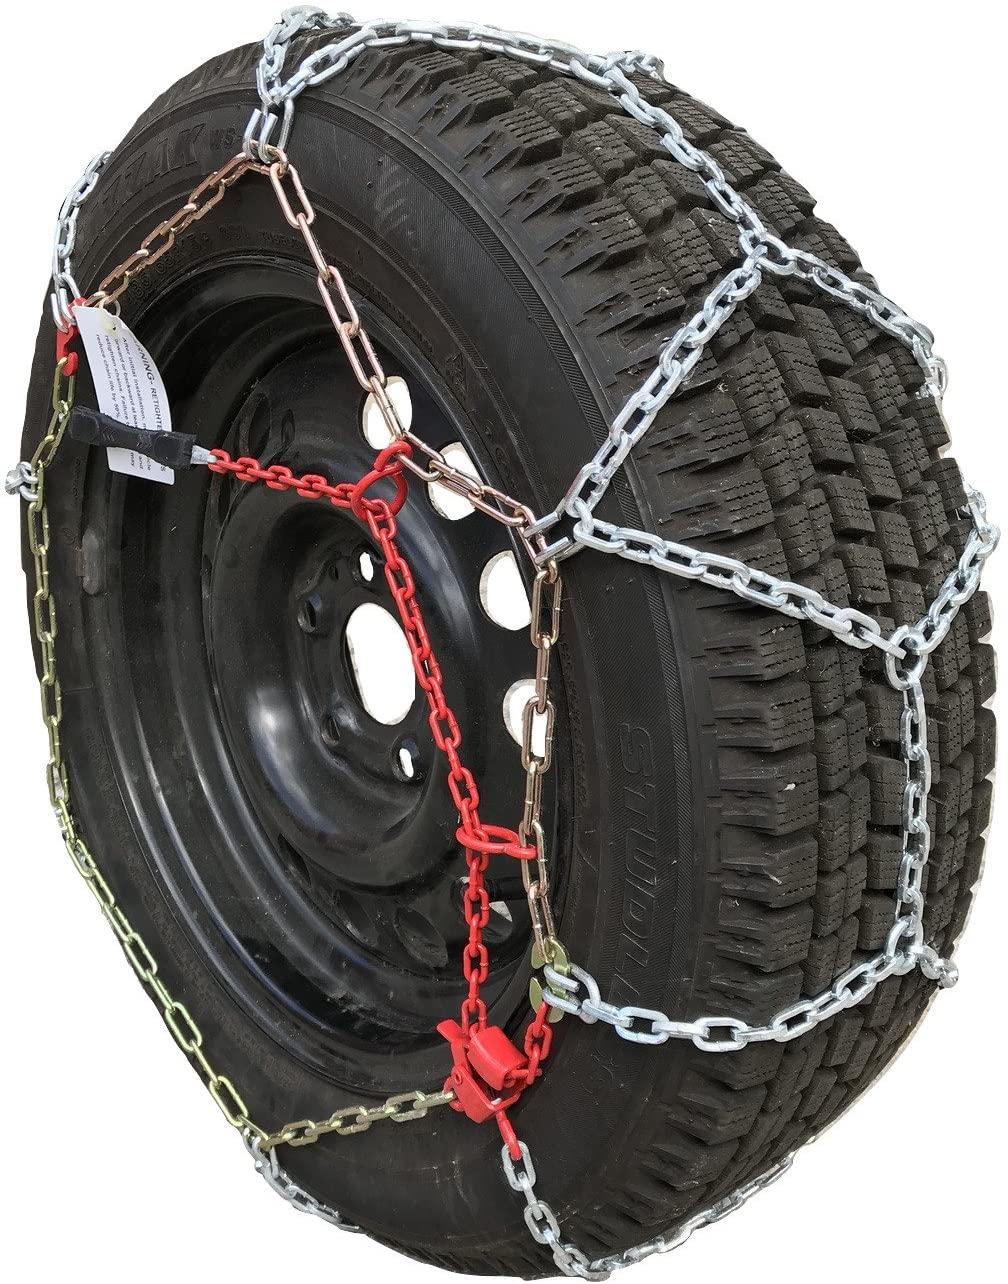 TireChain.com 305/50R20, 305/50 20 ONORM Diamond Tire Chains Set of 2